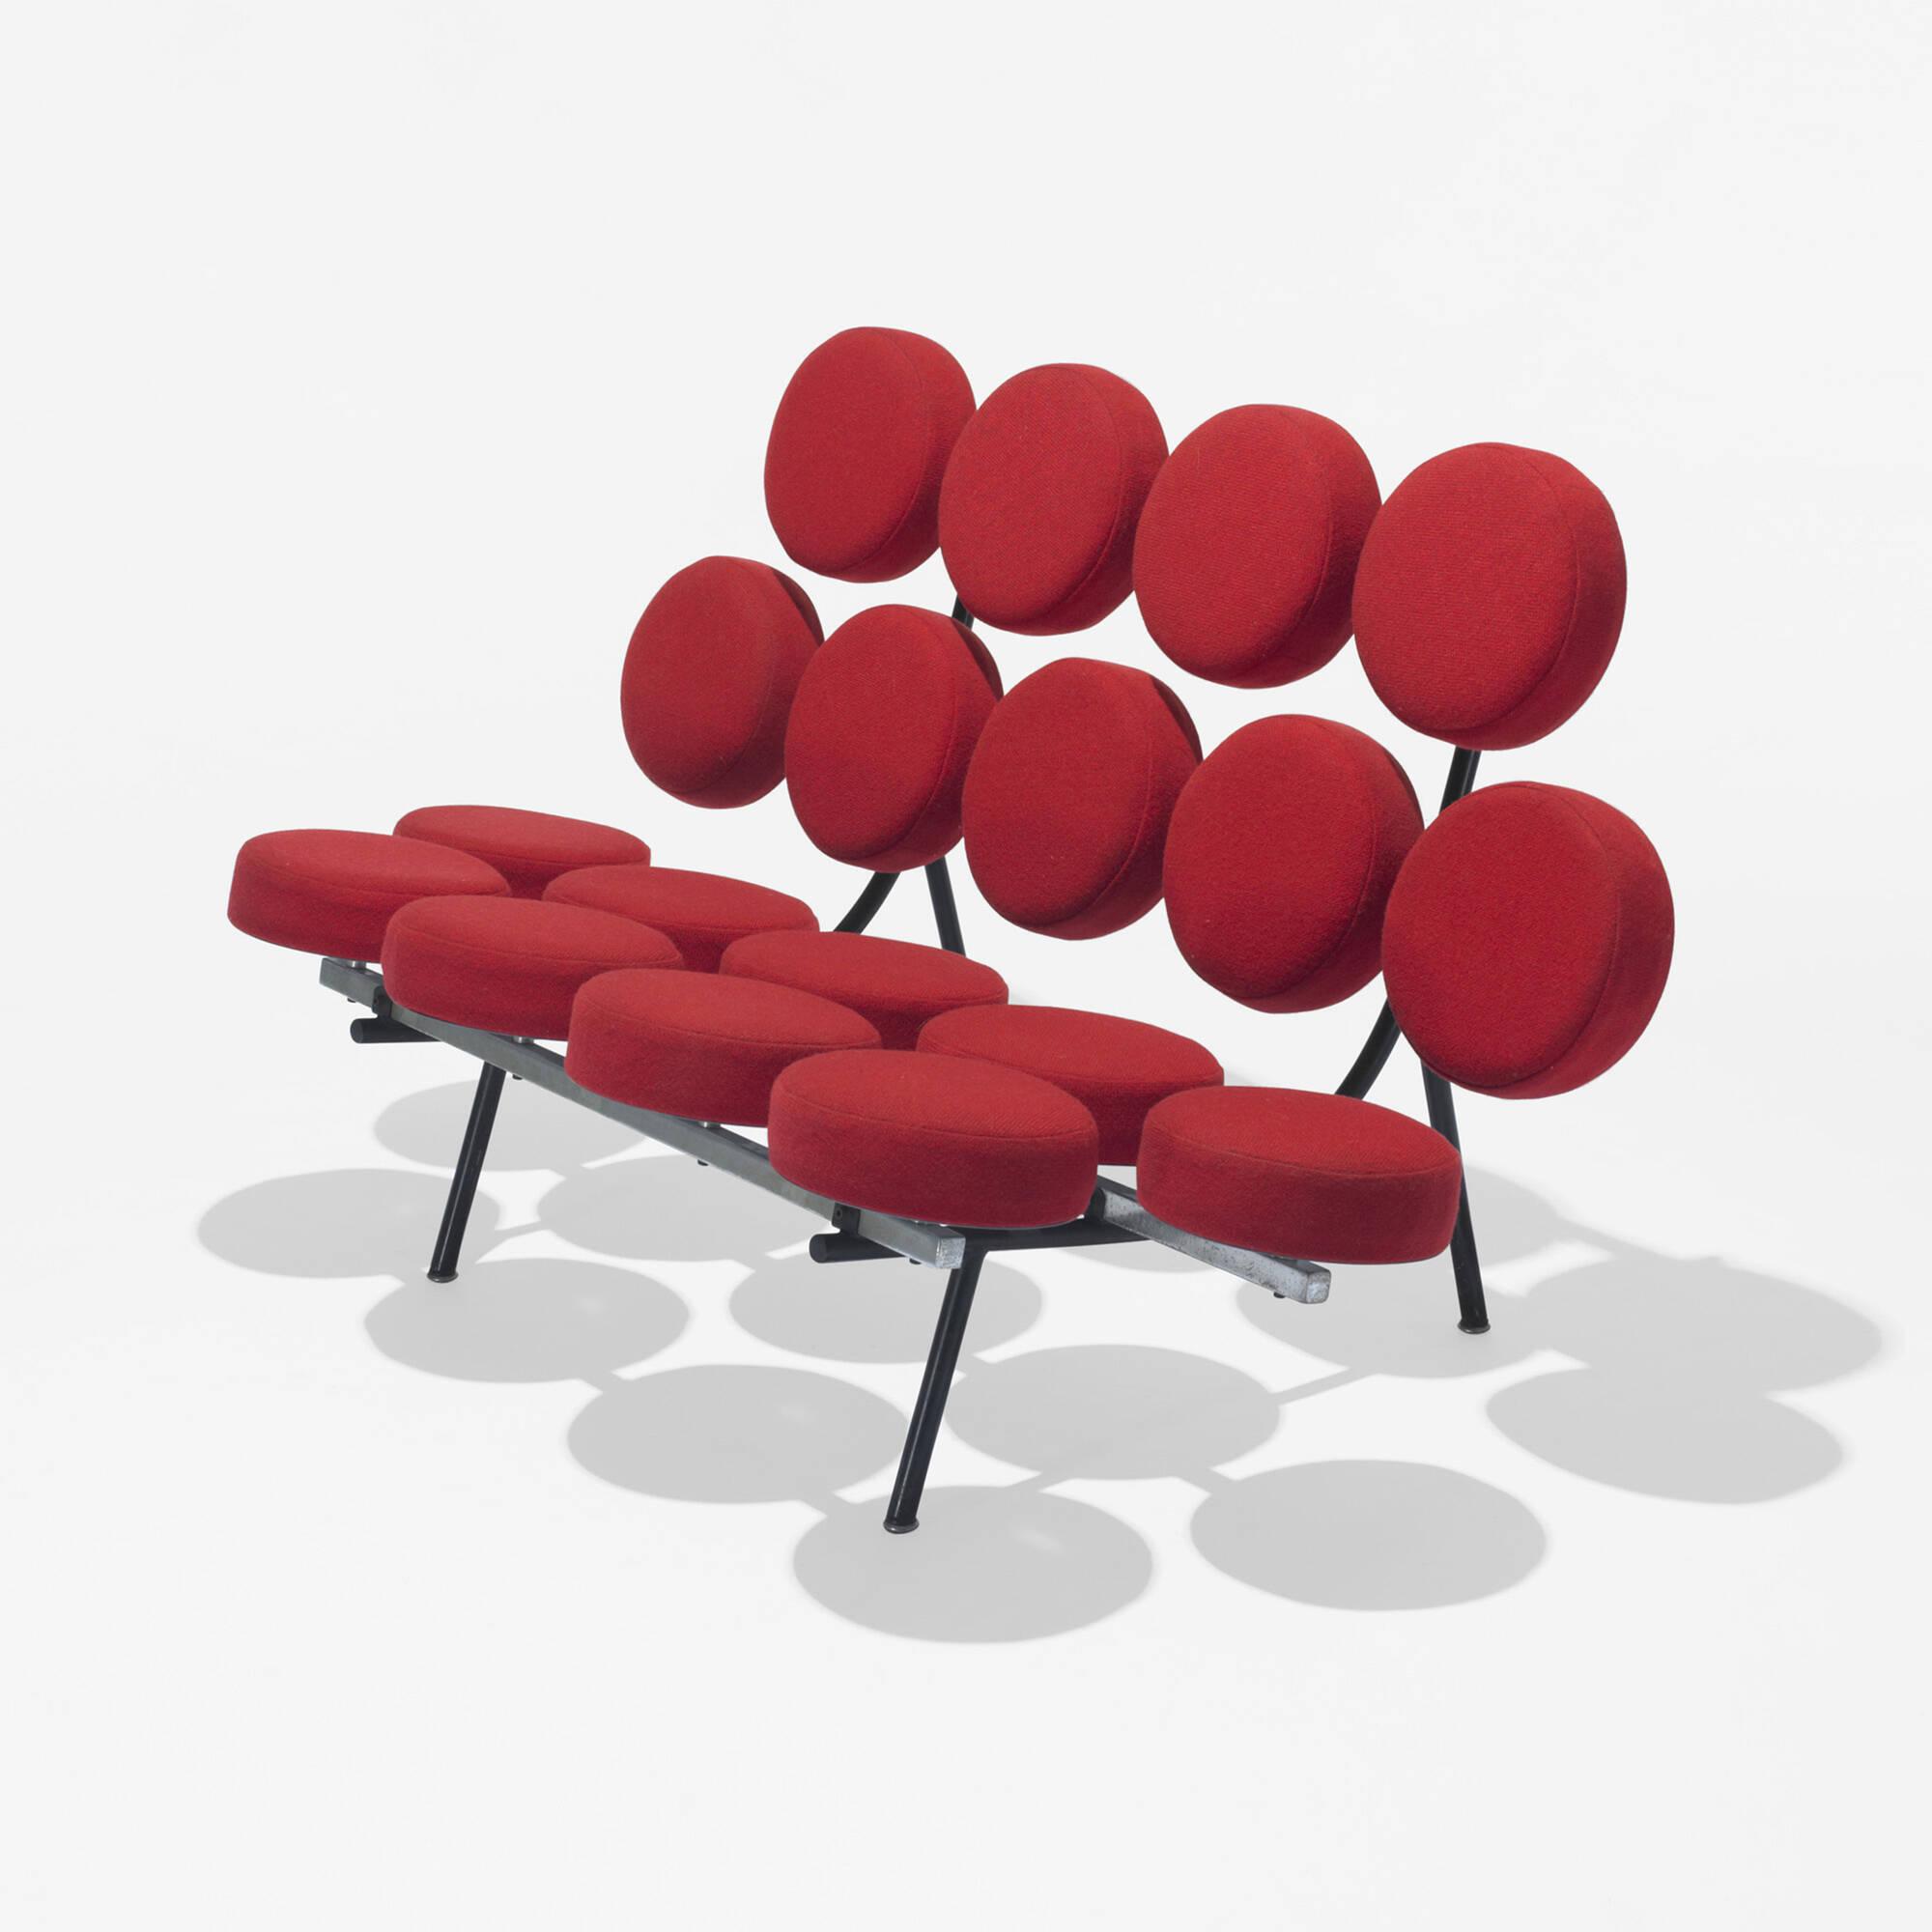 Charmant 102: George Nelson U0026 Associates / Marshmallow Sofa (1 Of ...